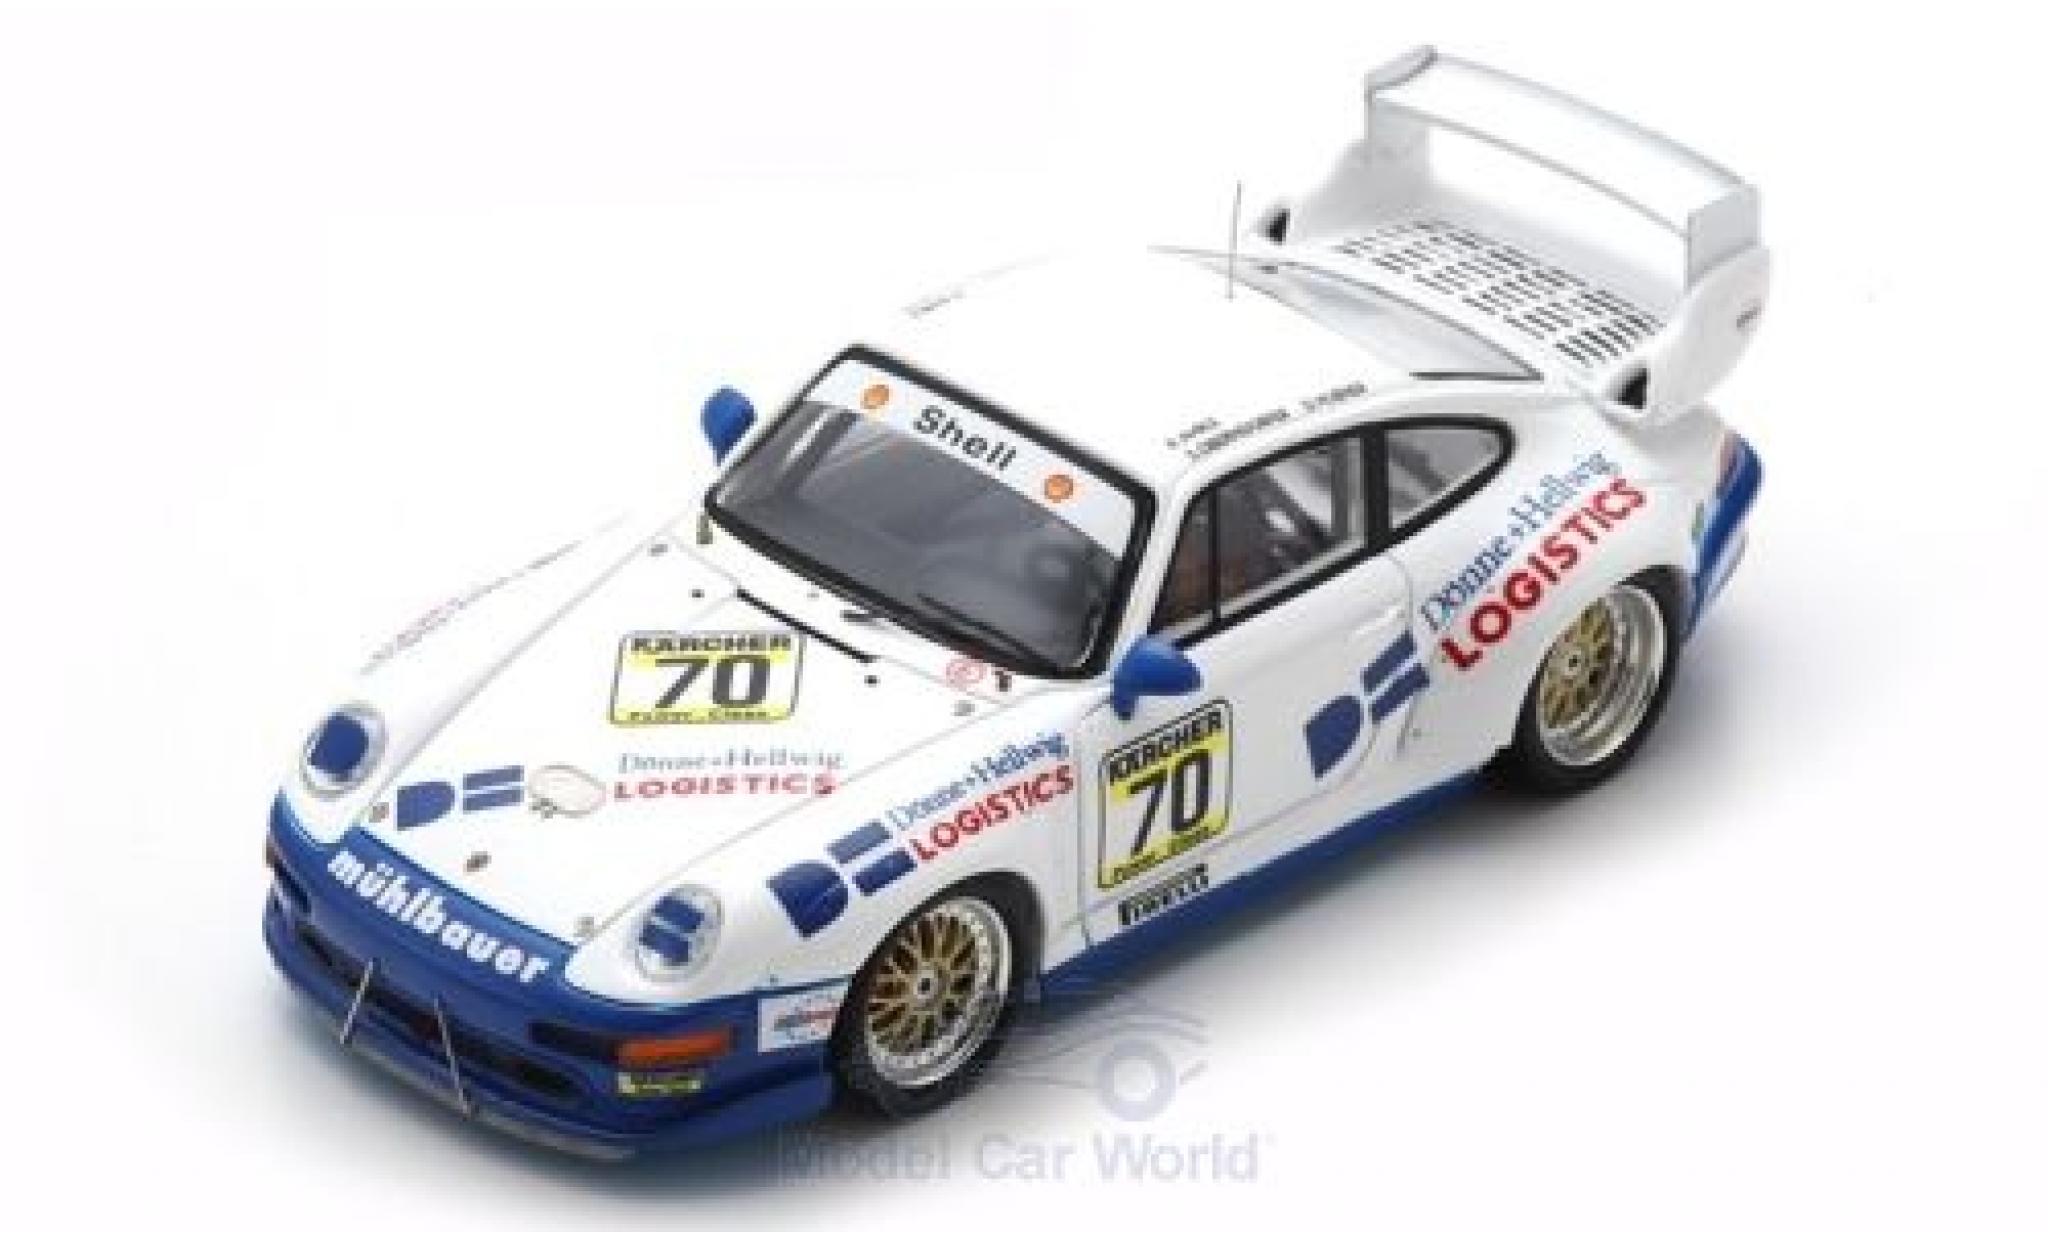 Porsche 993 GT2 1/43 Spark 911  No.70 1000km Paris 1995 S.Oberndorfer/D.Hübner